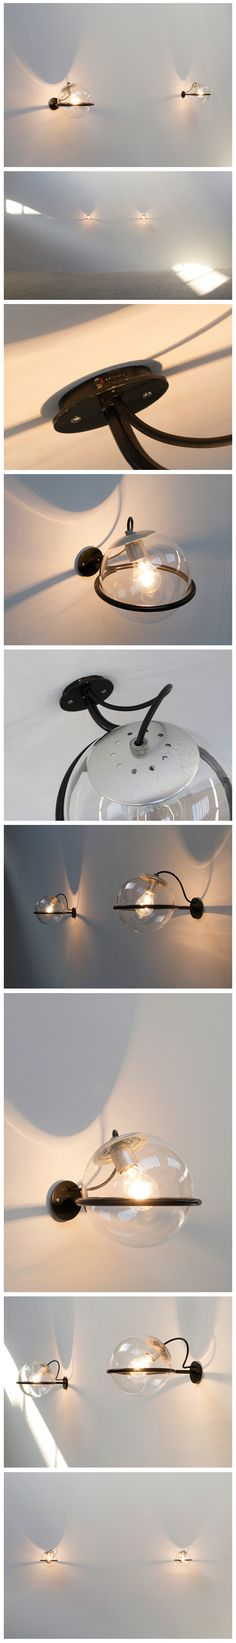 Good Modern Living Room Chandelier Novelty Fixtures Nordic Hanging Lights Restaurant Pendant Lamps Bedroom Lighting Led Chandeliers A Plastic Case Is Compartmentalized For Safe Storage Chandeliers